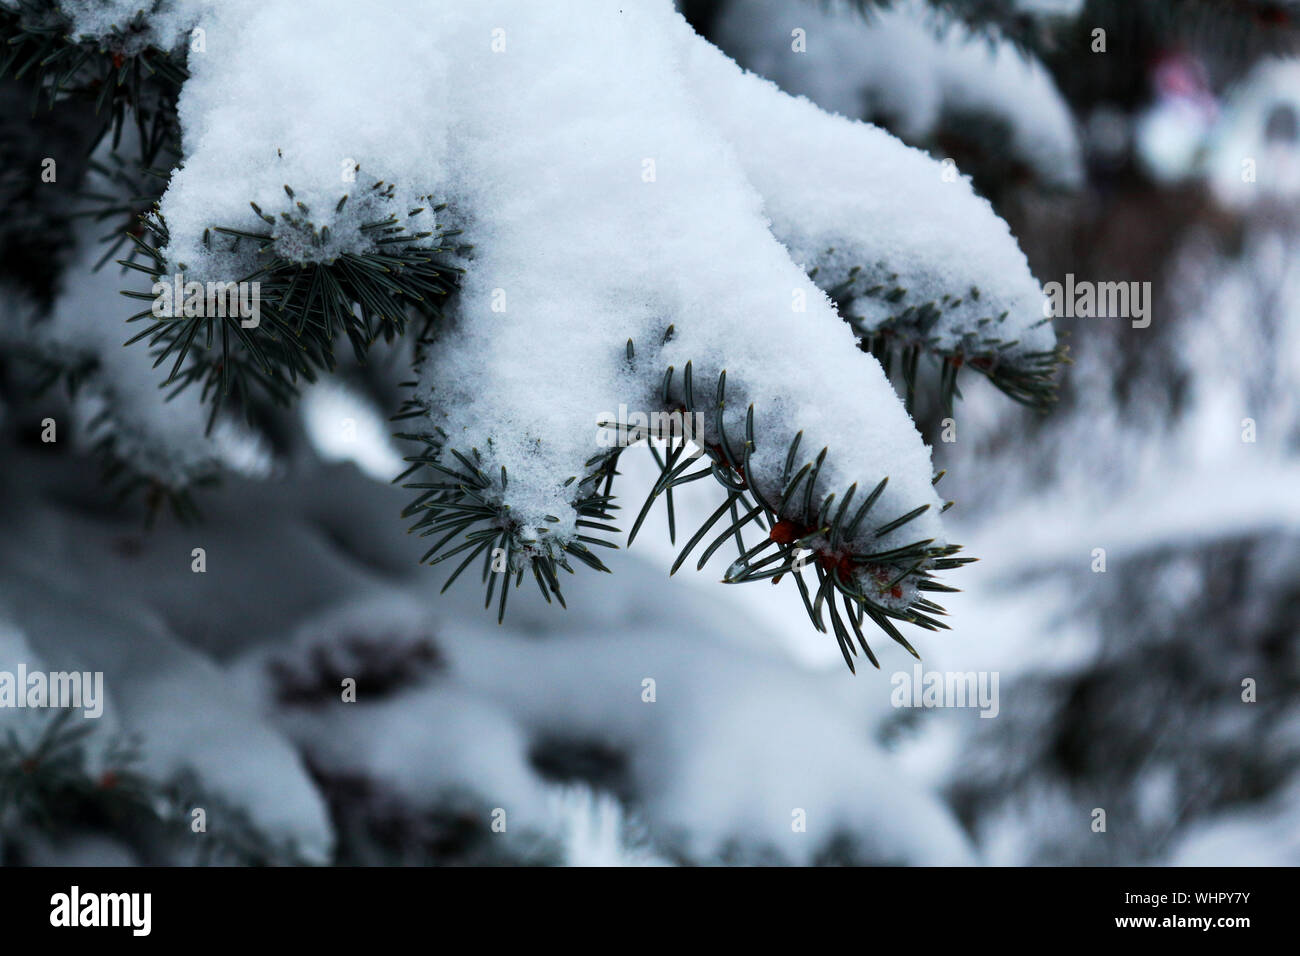 Christmas Tree Spruce Frost Snow Landscape Background Wallpaper Stock Photo Alamy